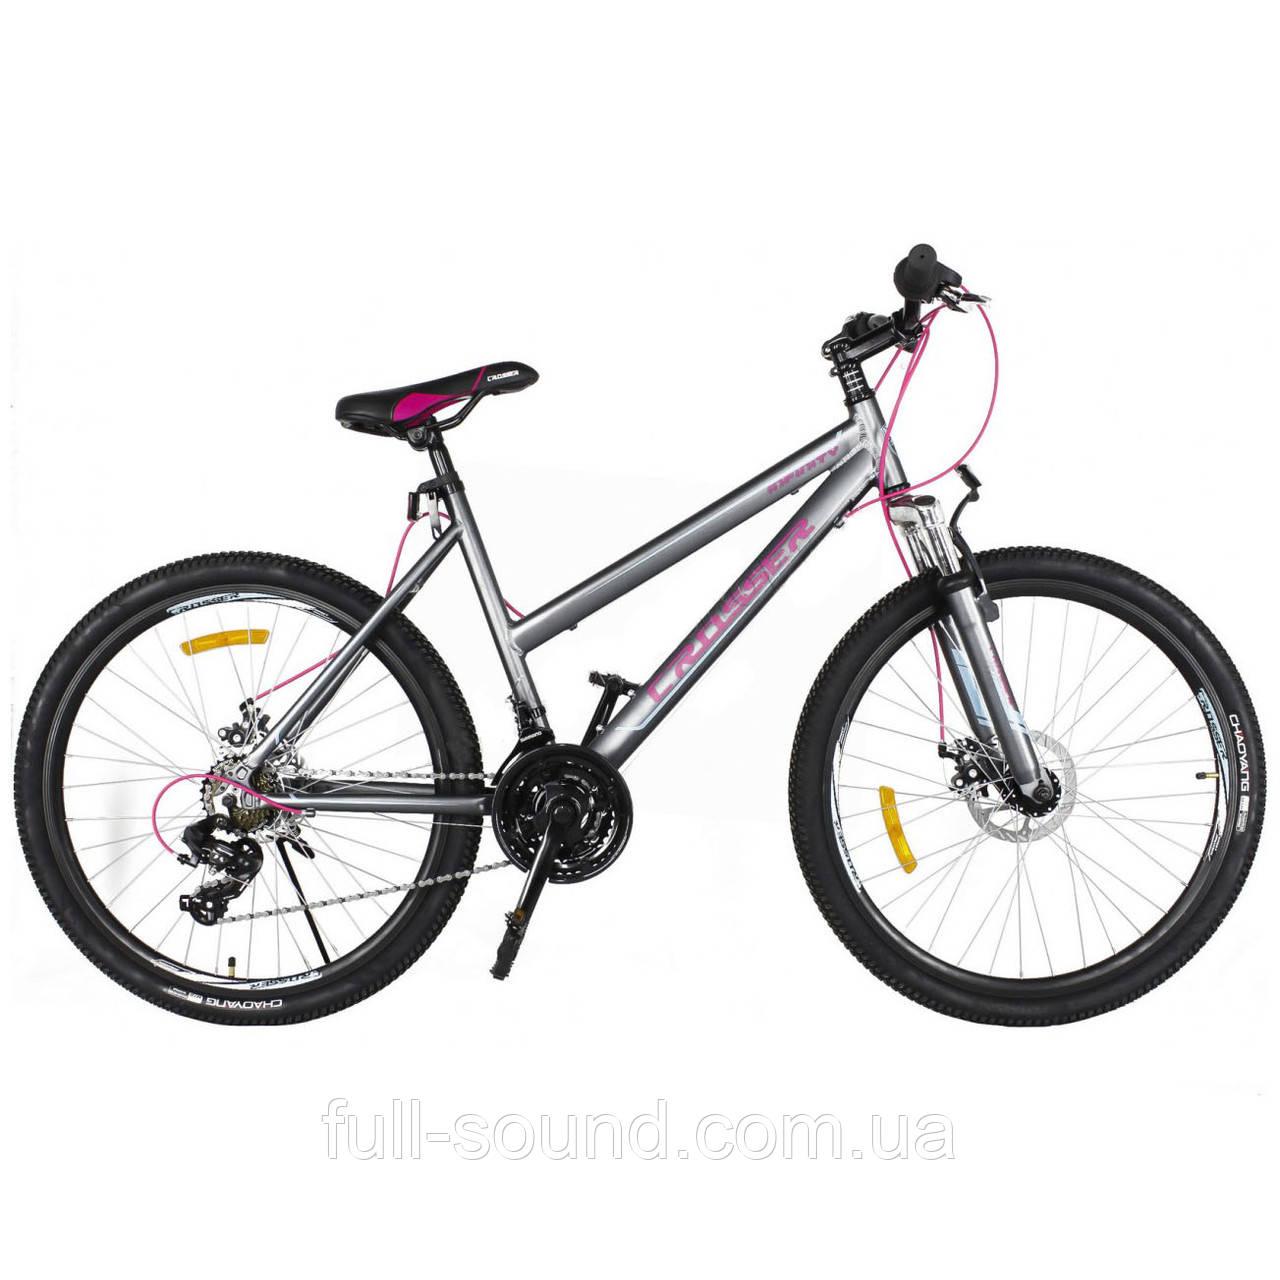 Женский велосипед сrosser infinity 24´